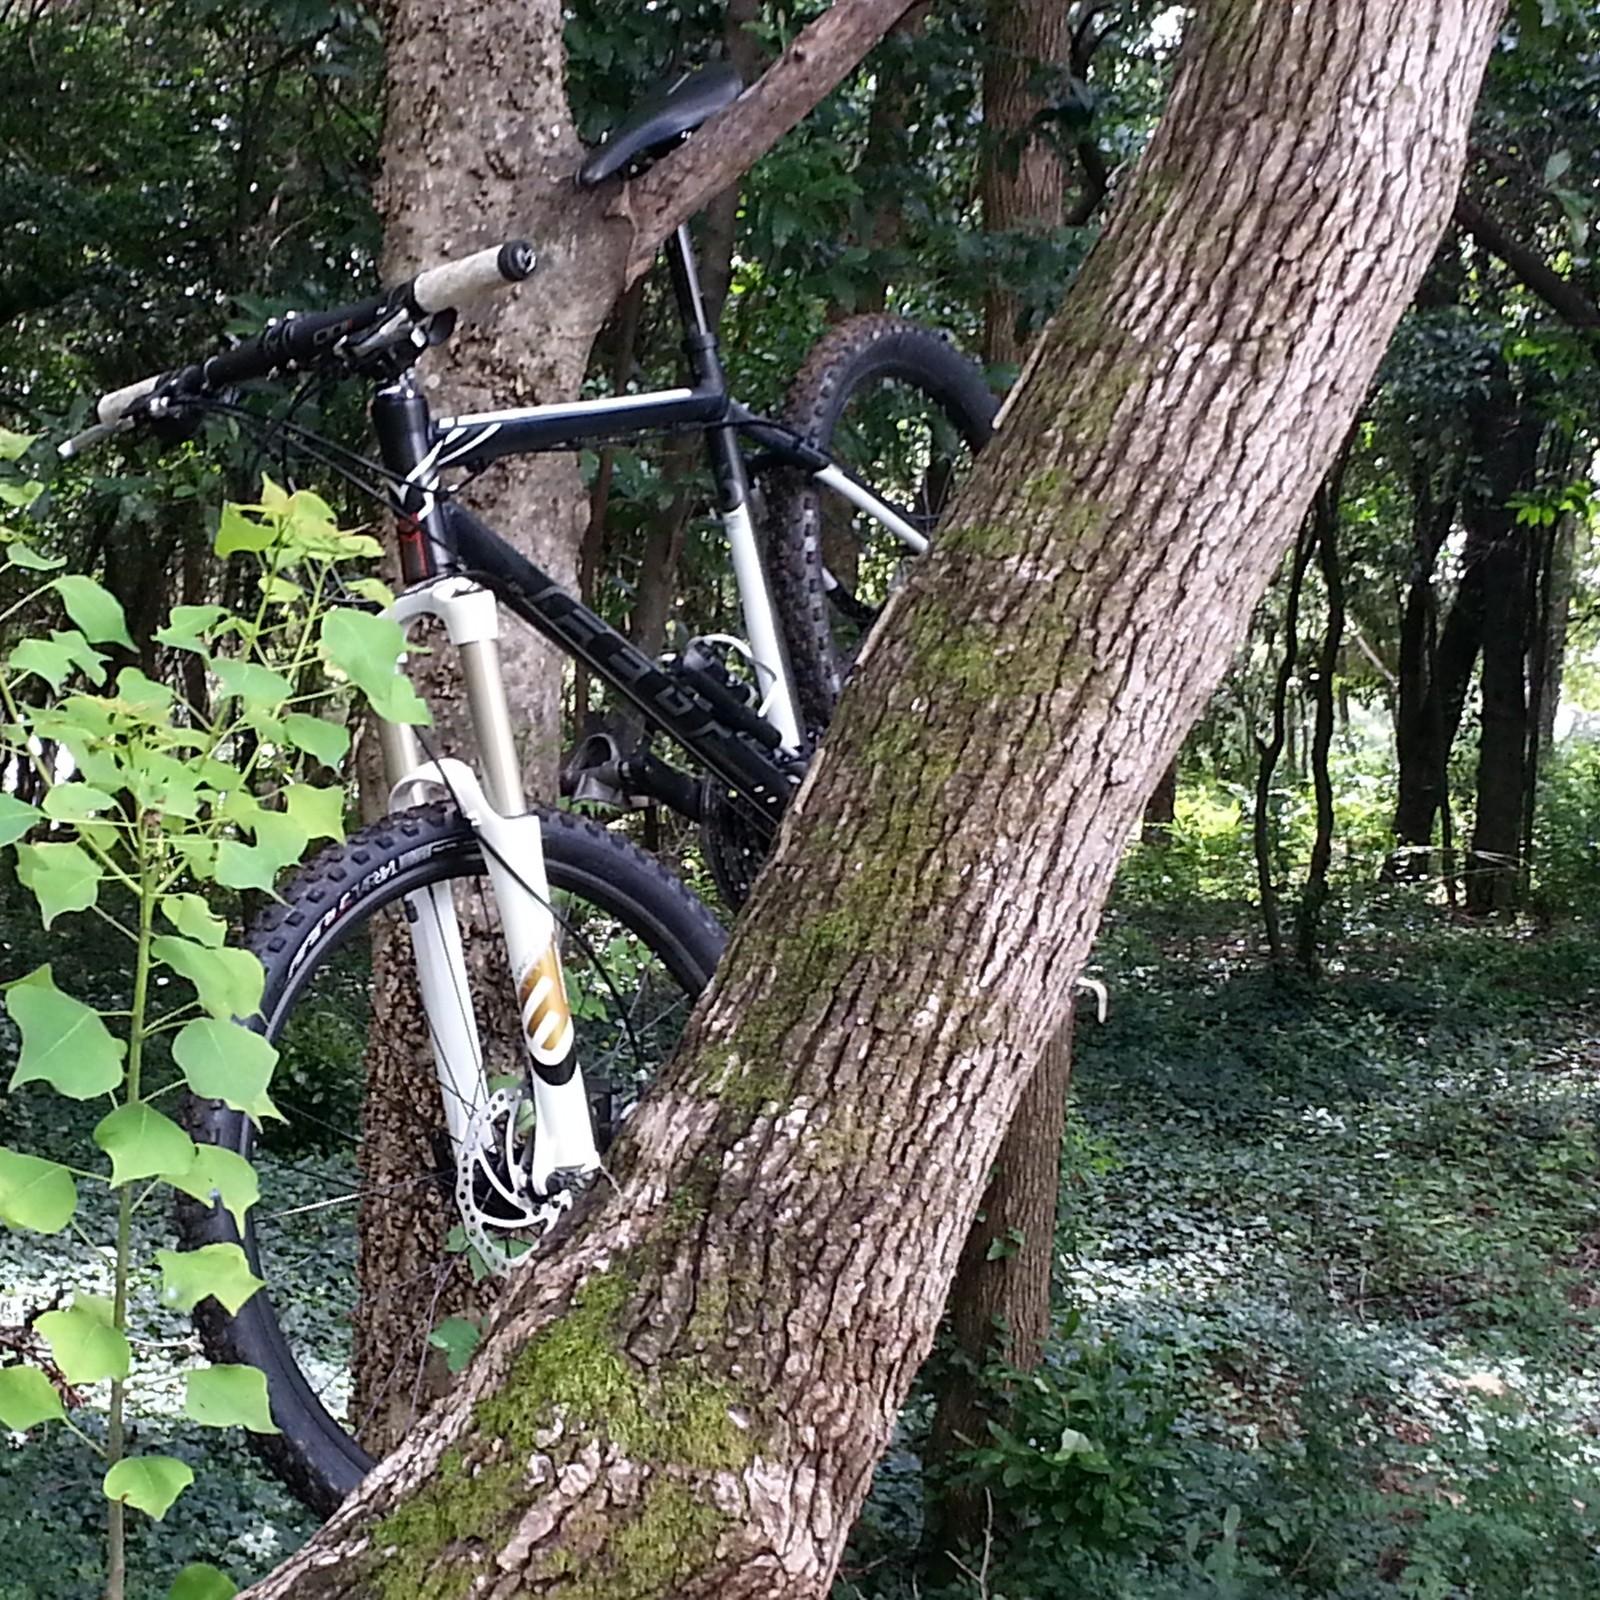 IMG 20130723 143820 - rtm334 - Mountain Biking Pictures - Vital MTB